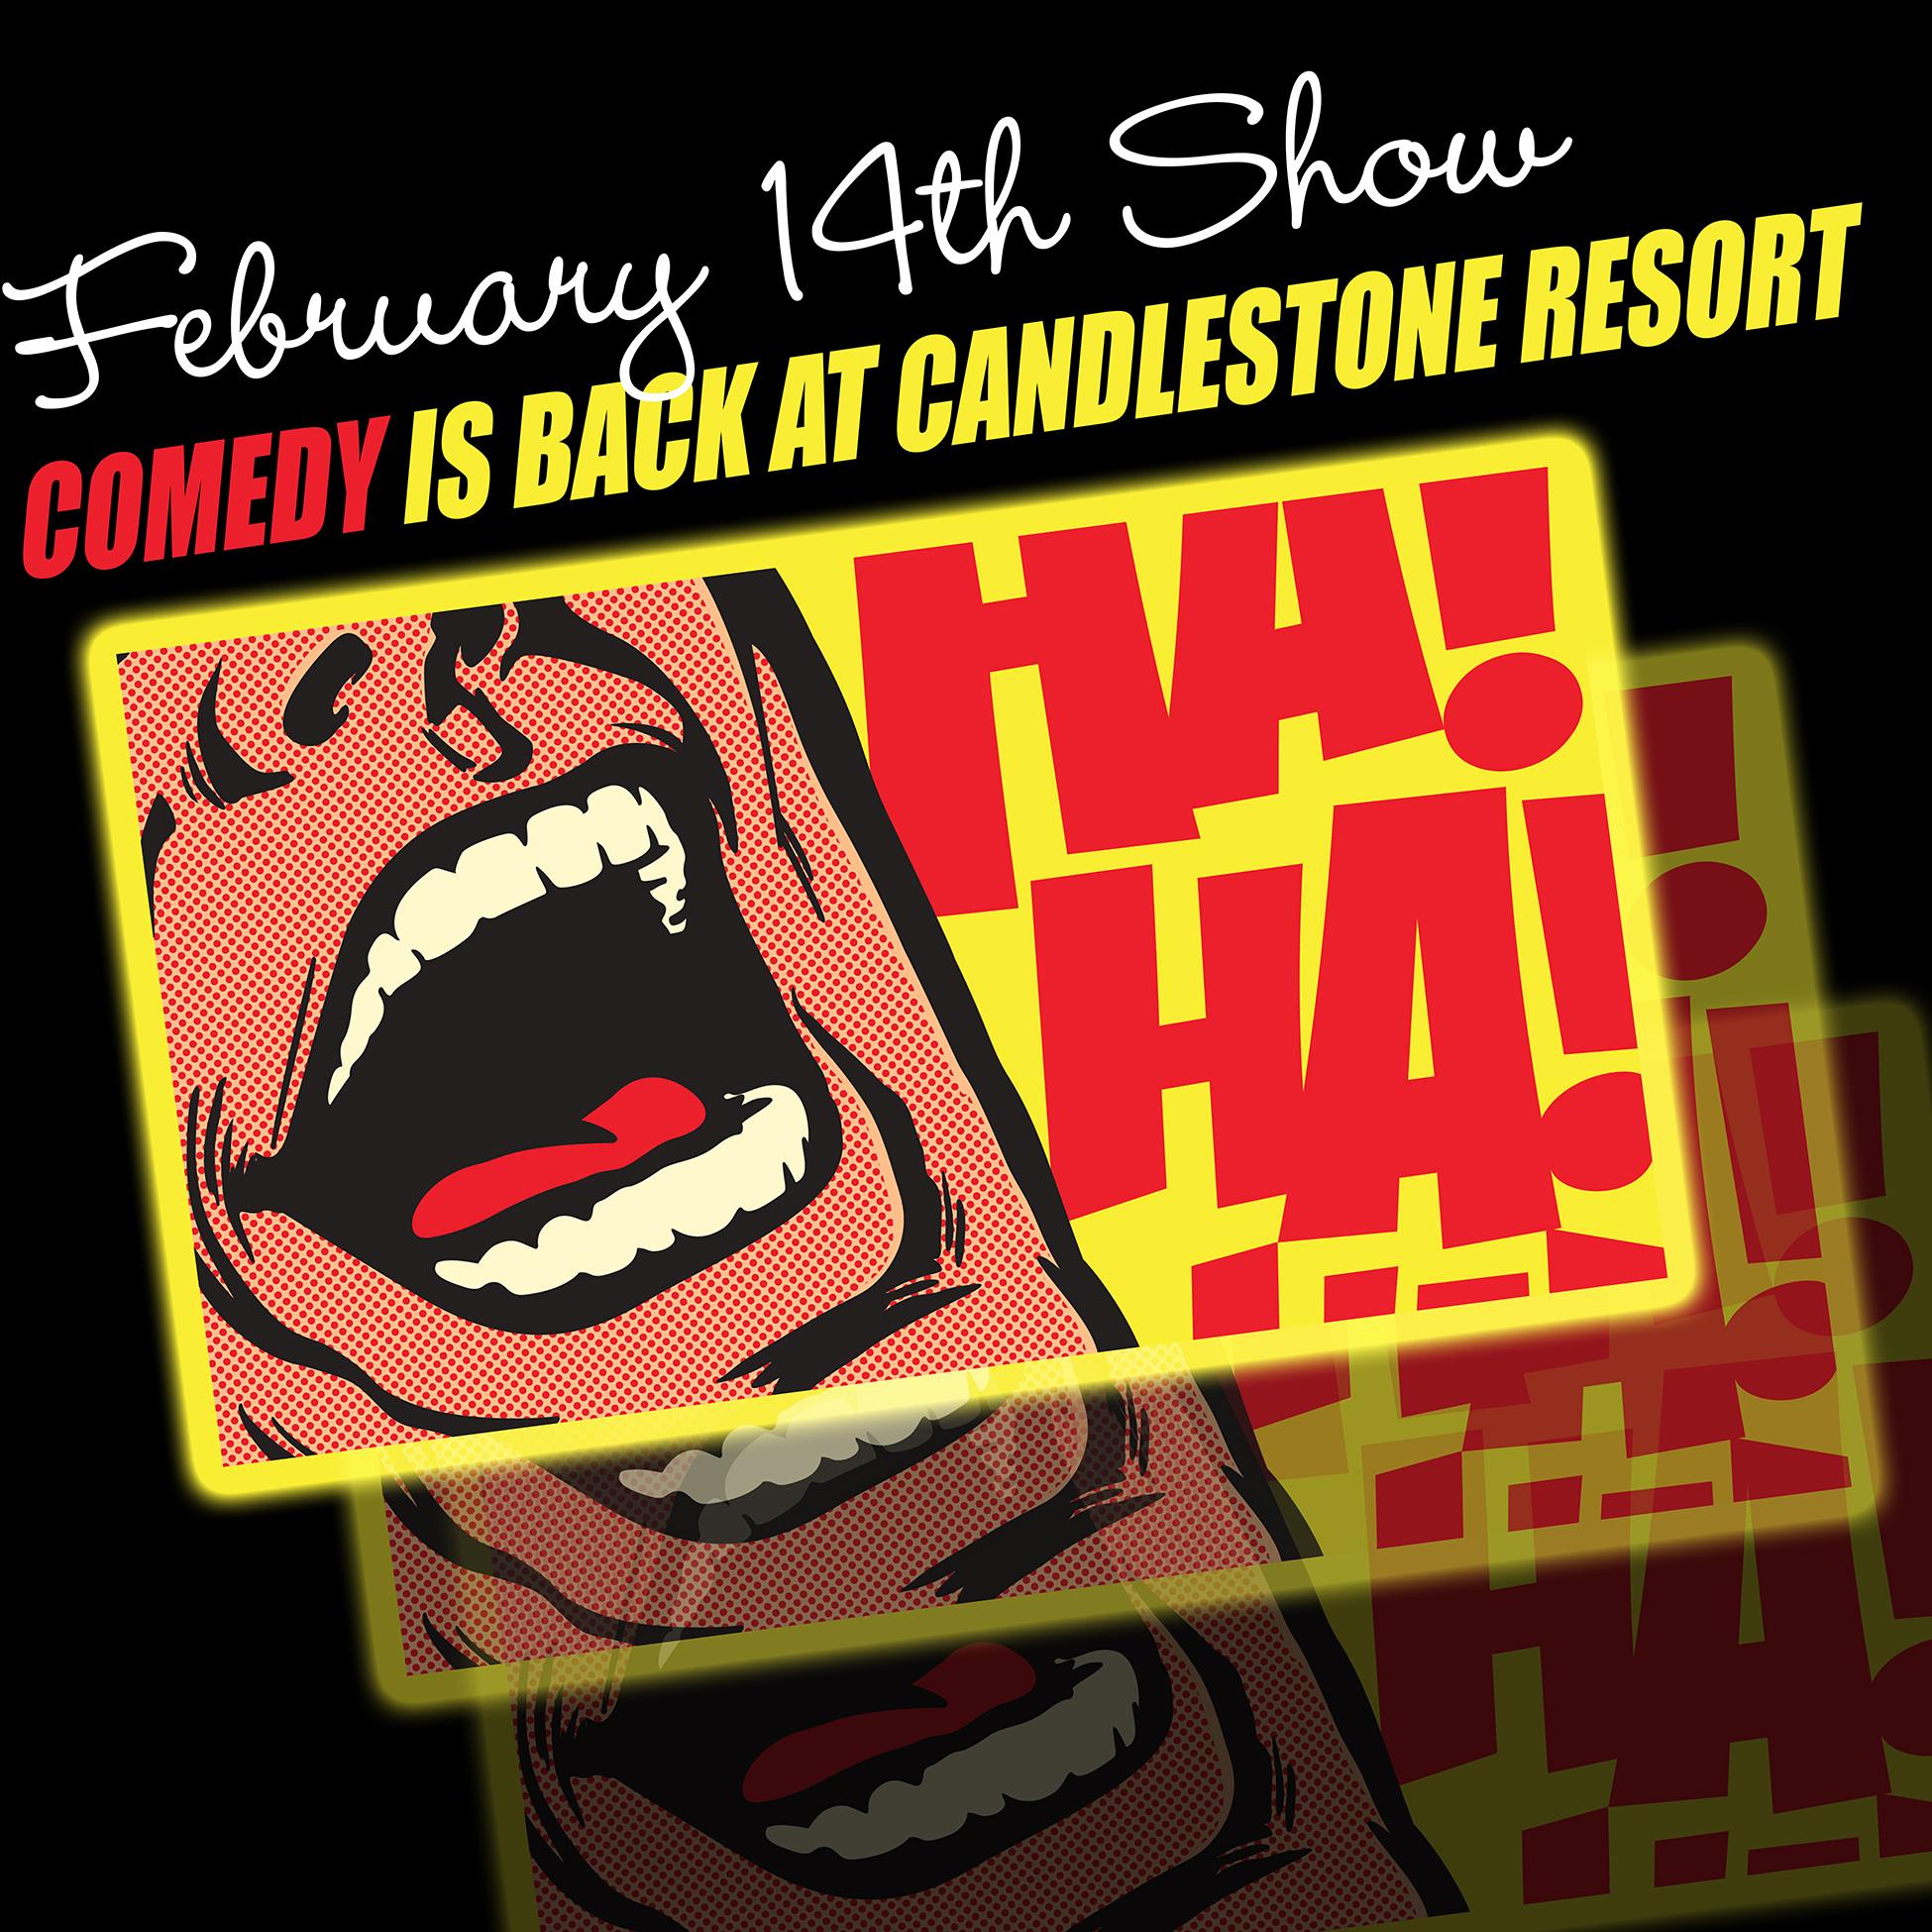 February 14th Comedy Show 2020-Comedy-Feb14th